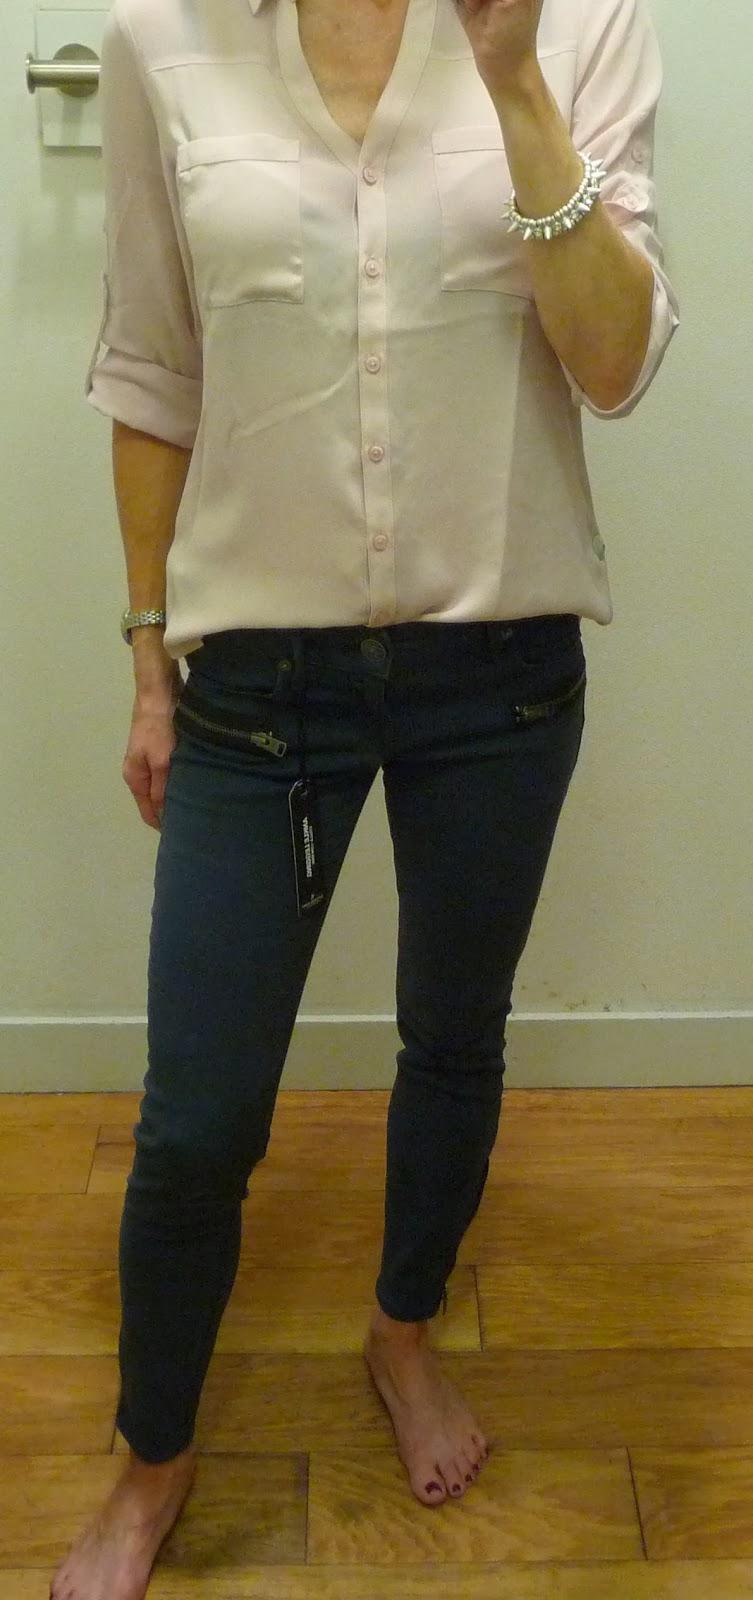 Express Portofino pink, stella ankle legging, jeans, zipper details